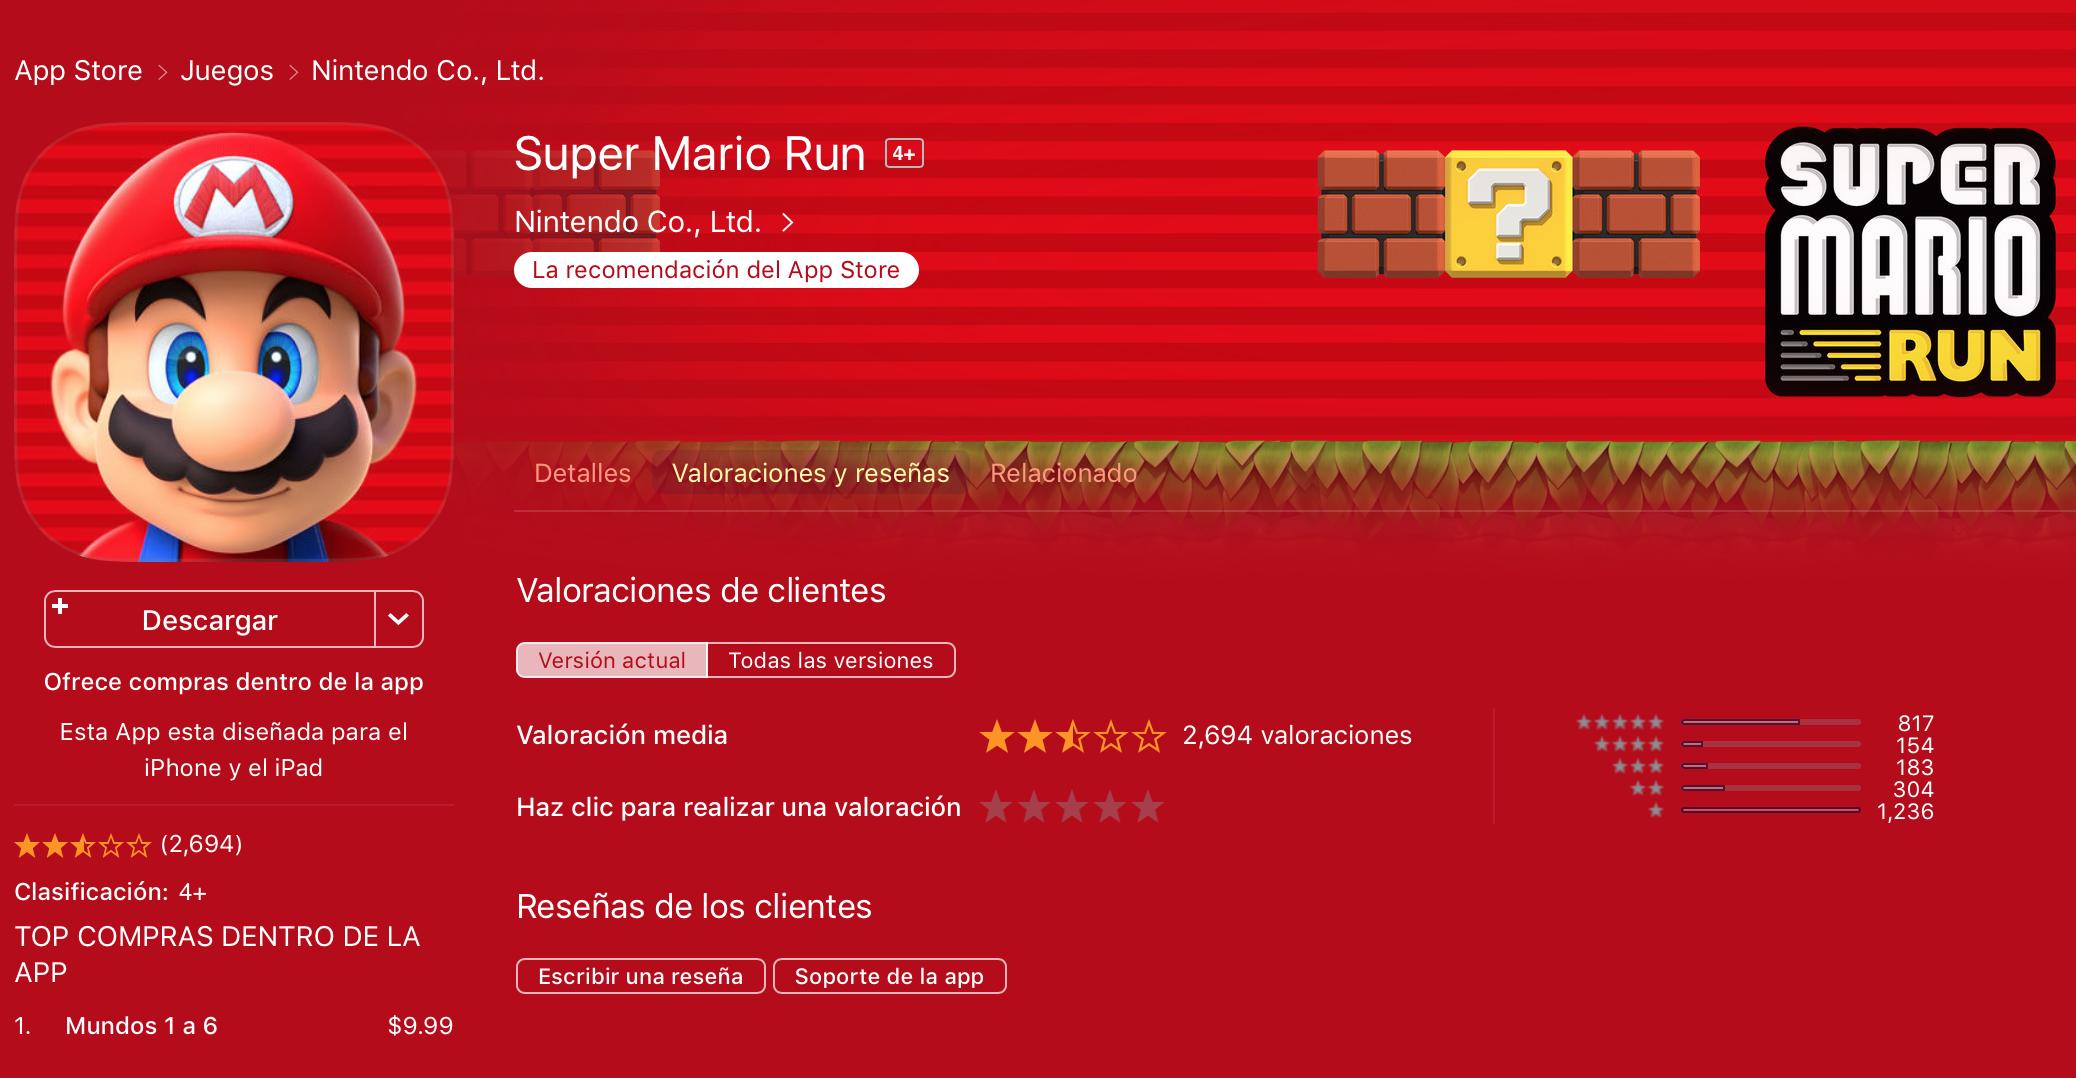 Mario reviews